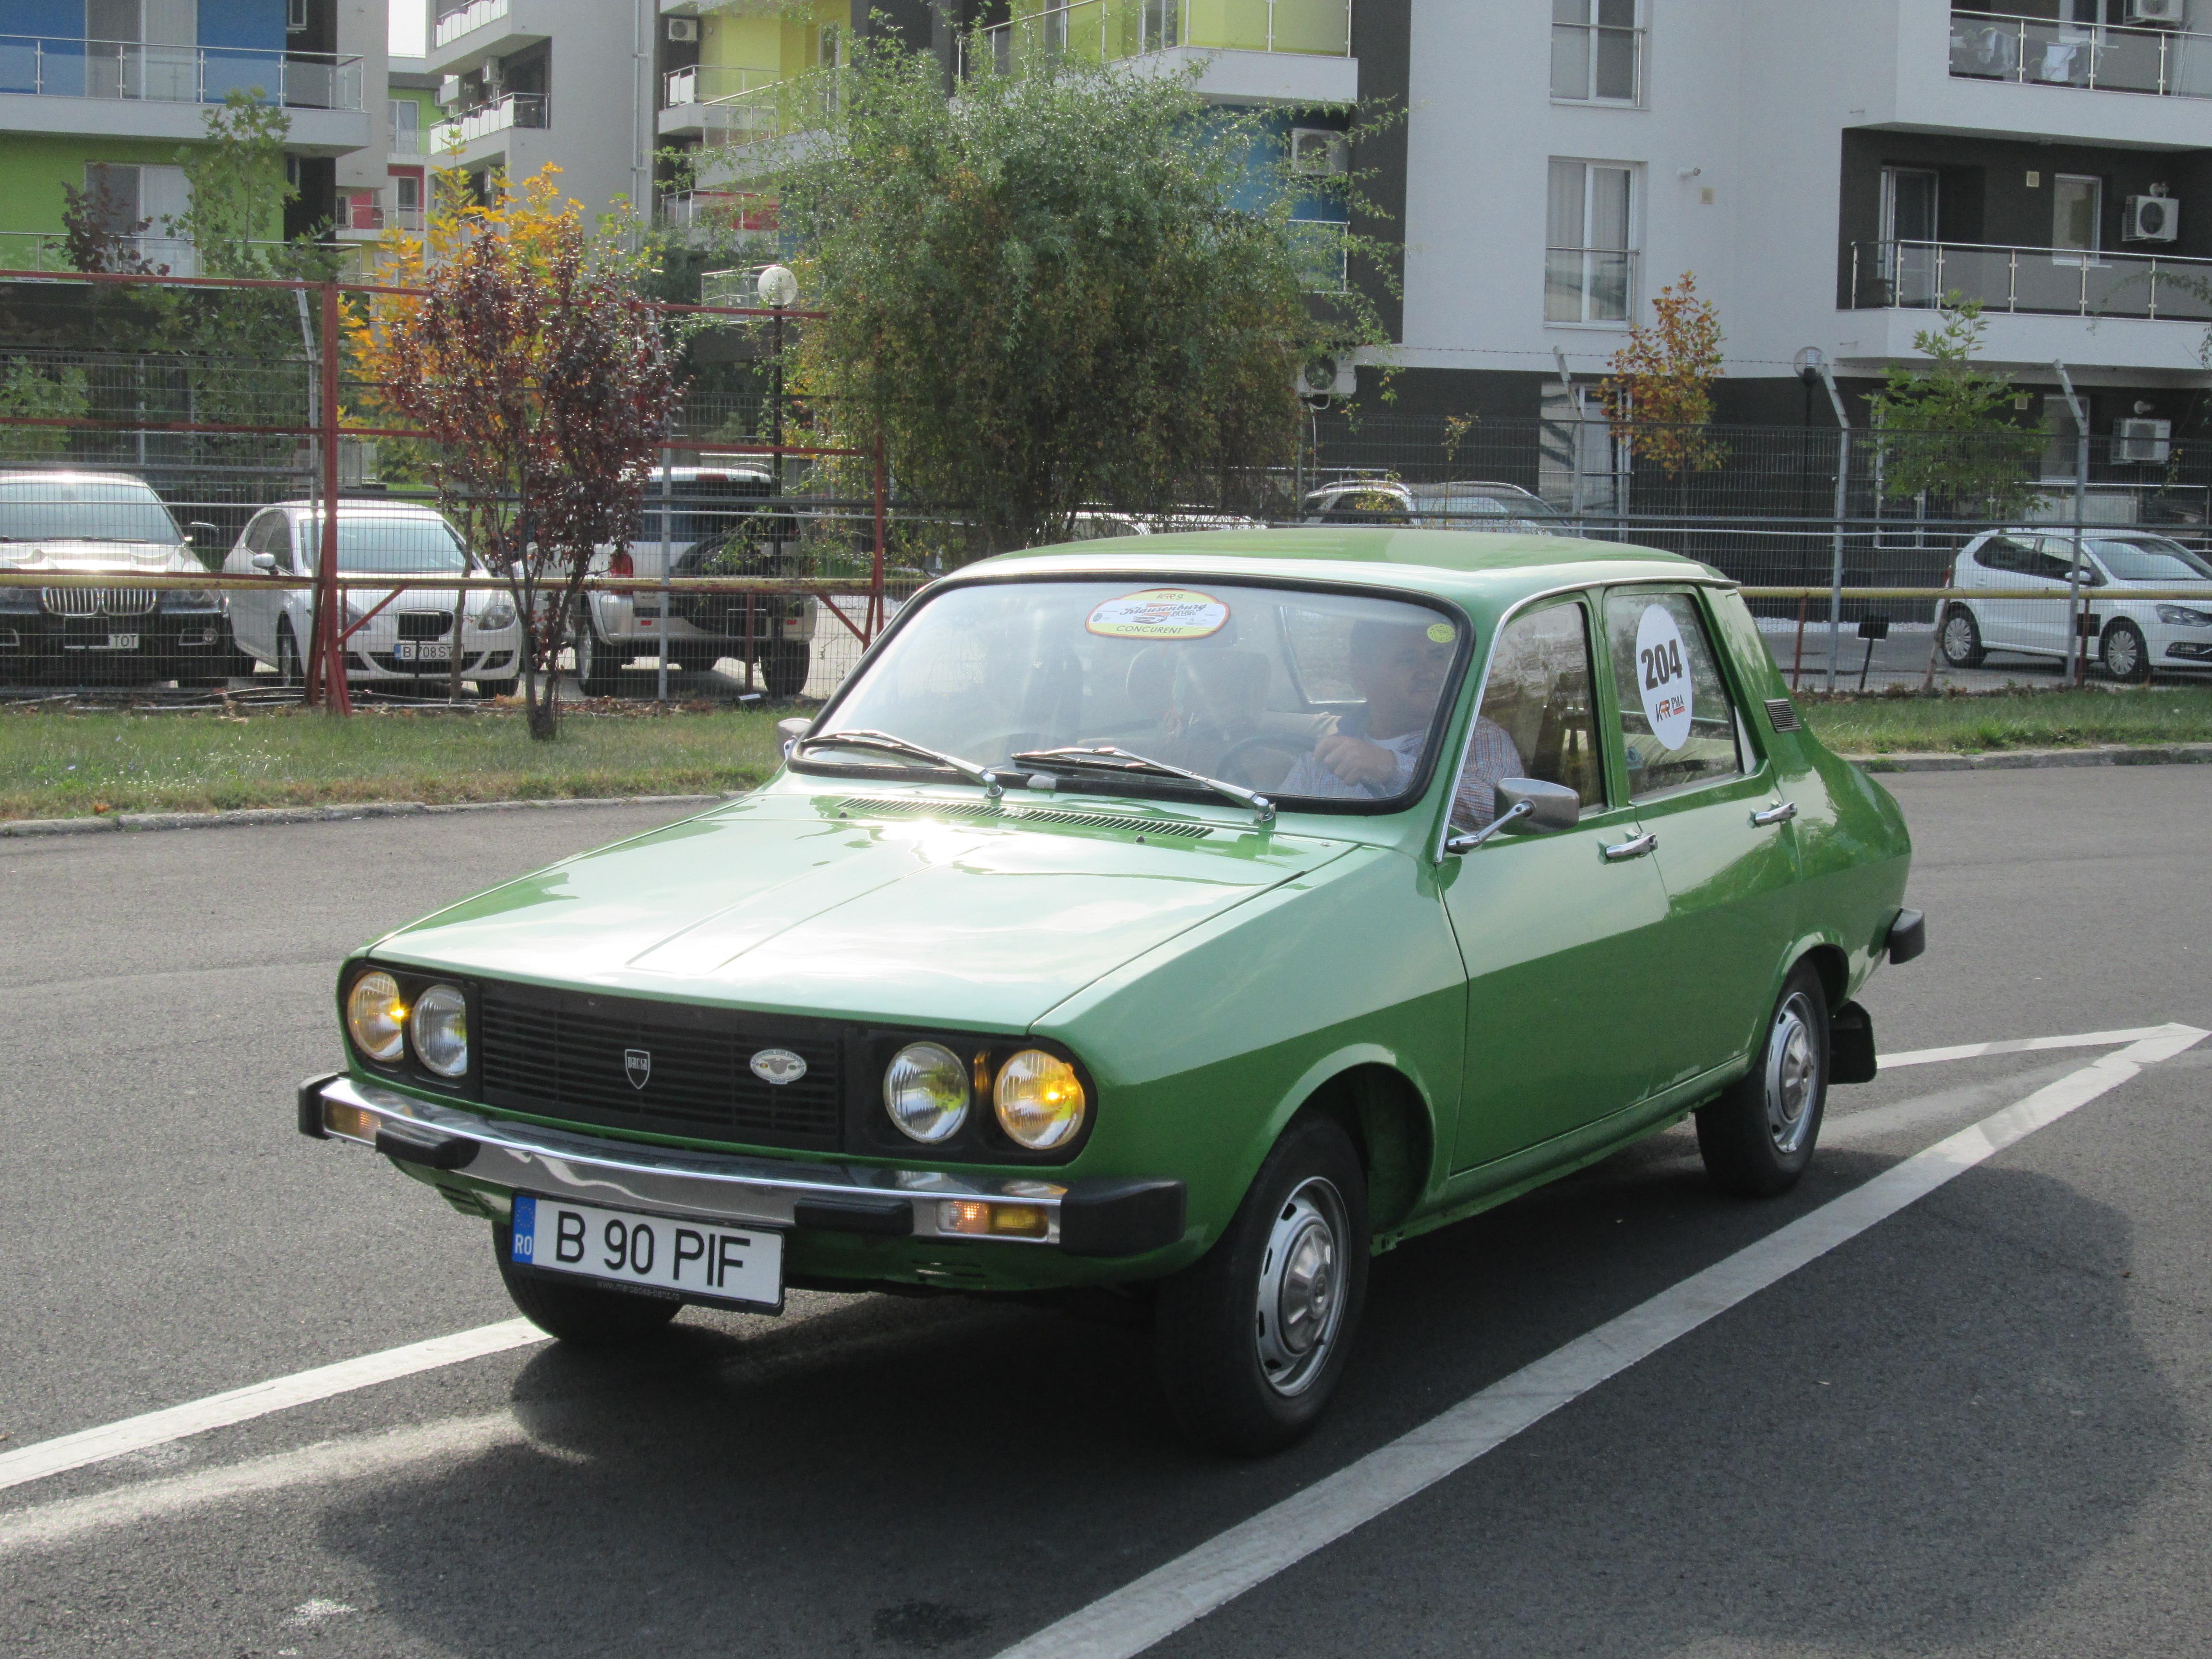 1982_Dacia_1310_(GDR_export_model)_in_Bu